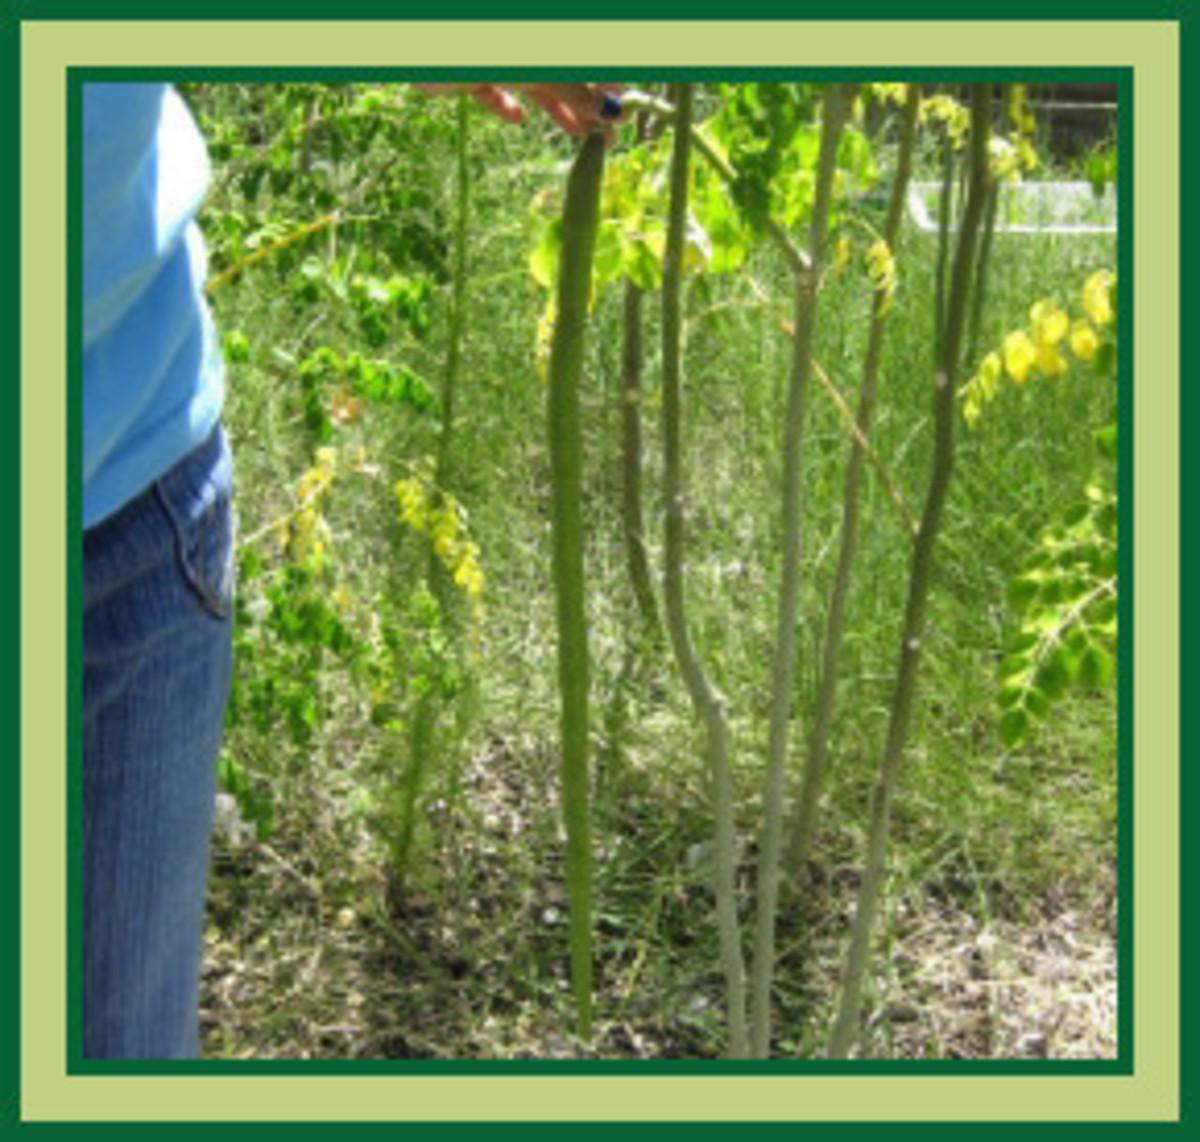 More of our Moringa drumsticks